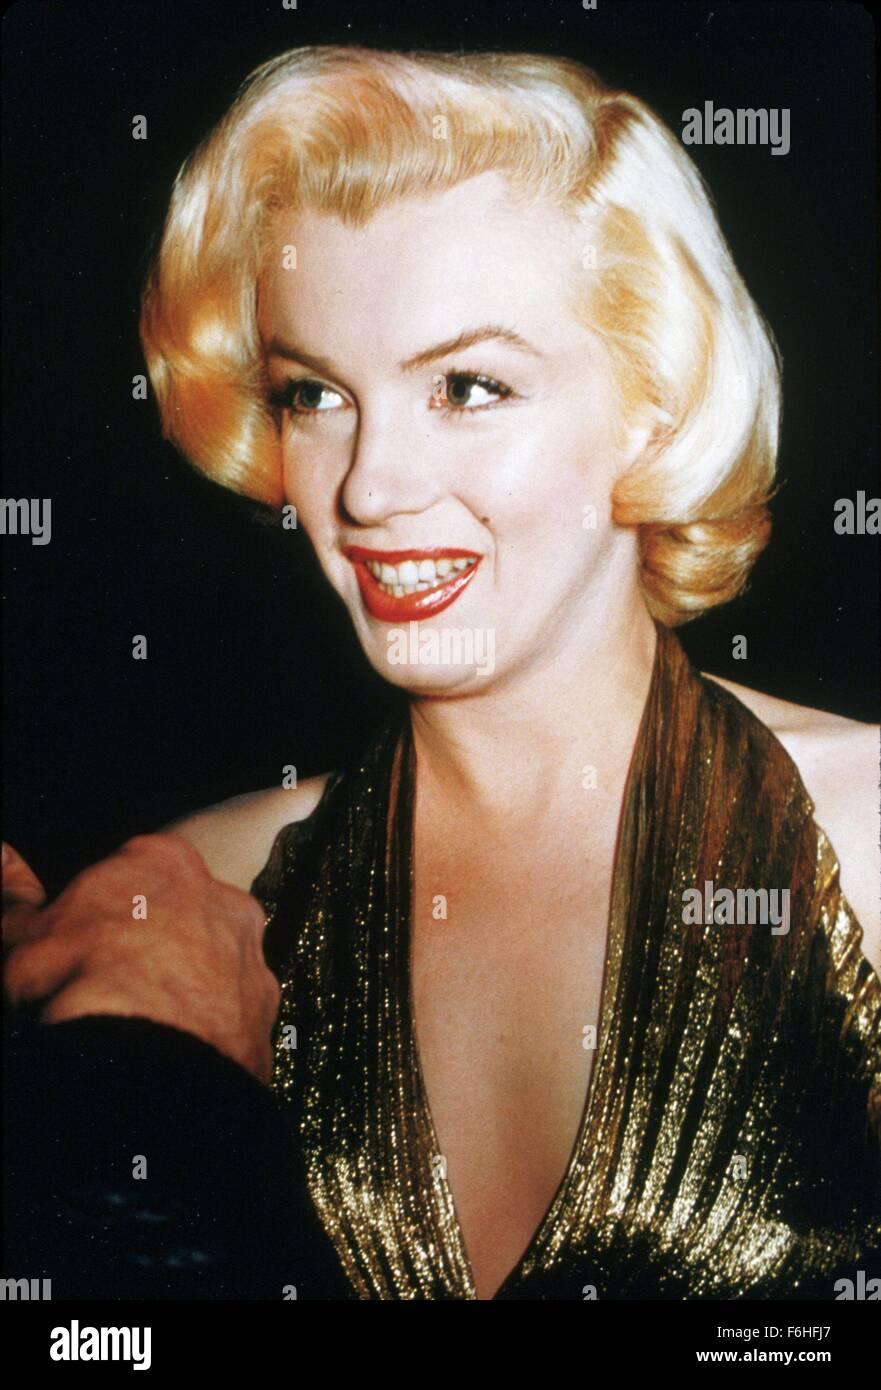 Cleavage Marilyn Monroe nudes (95 photo), Pussy, Bikini, Feet, braless 2015